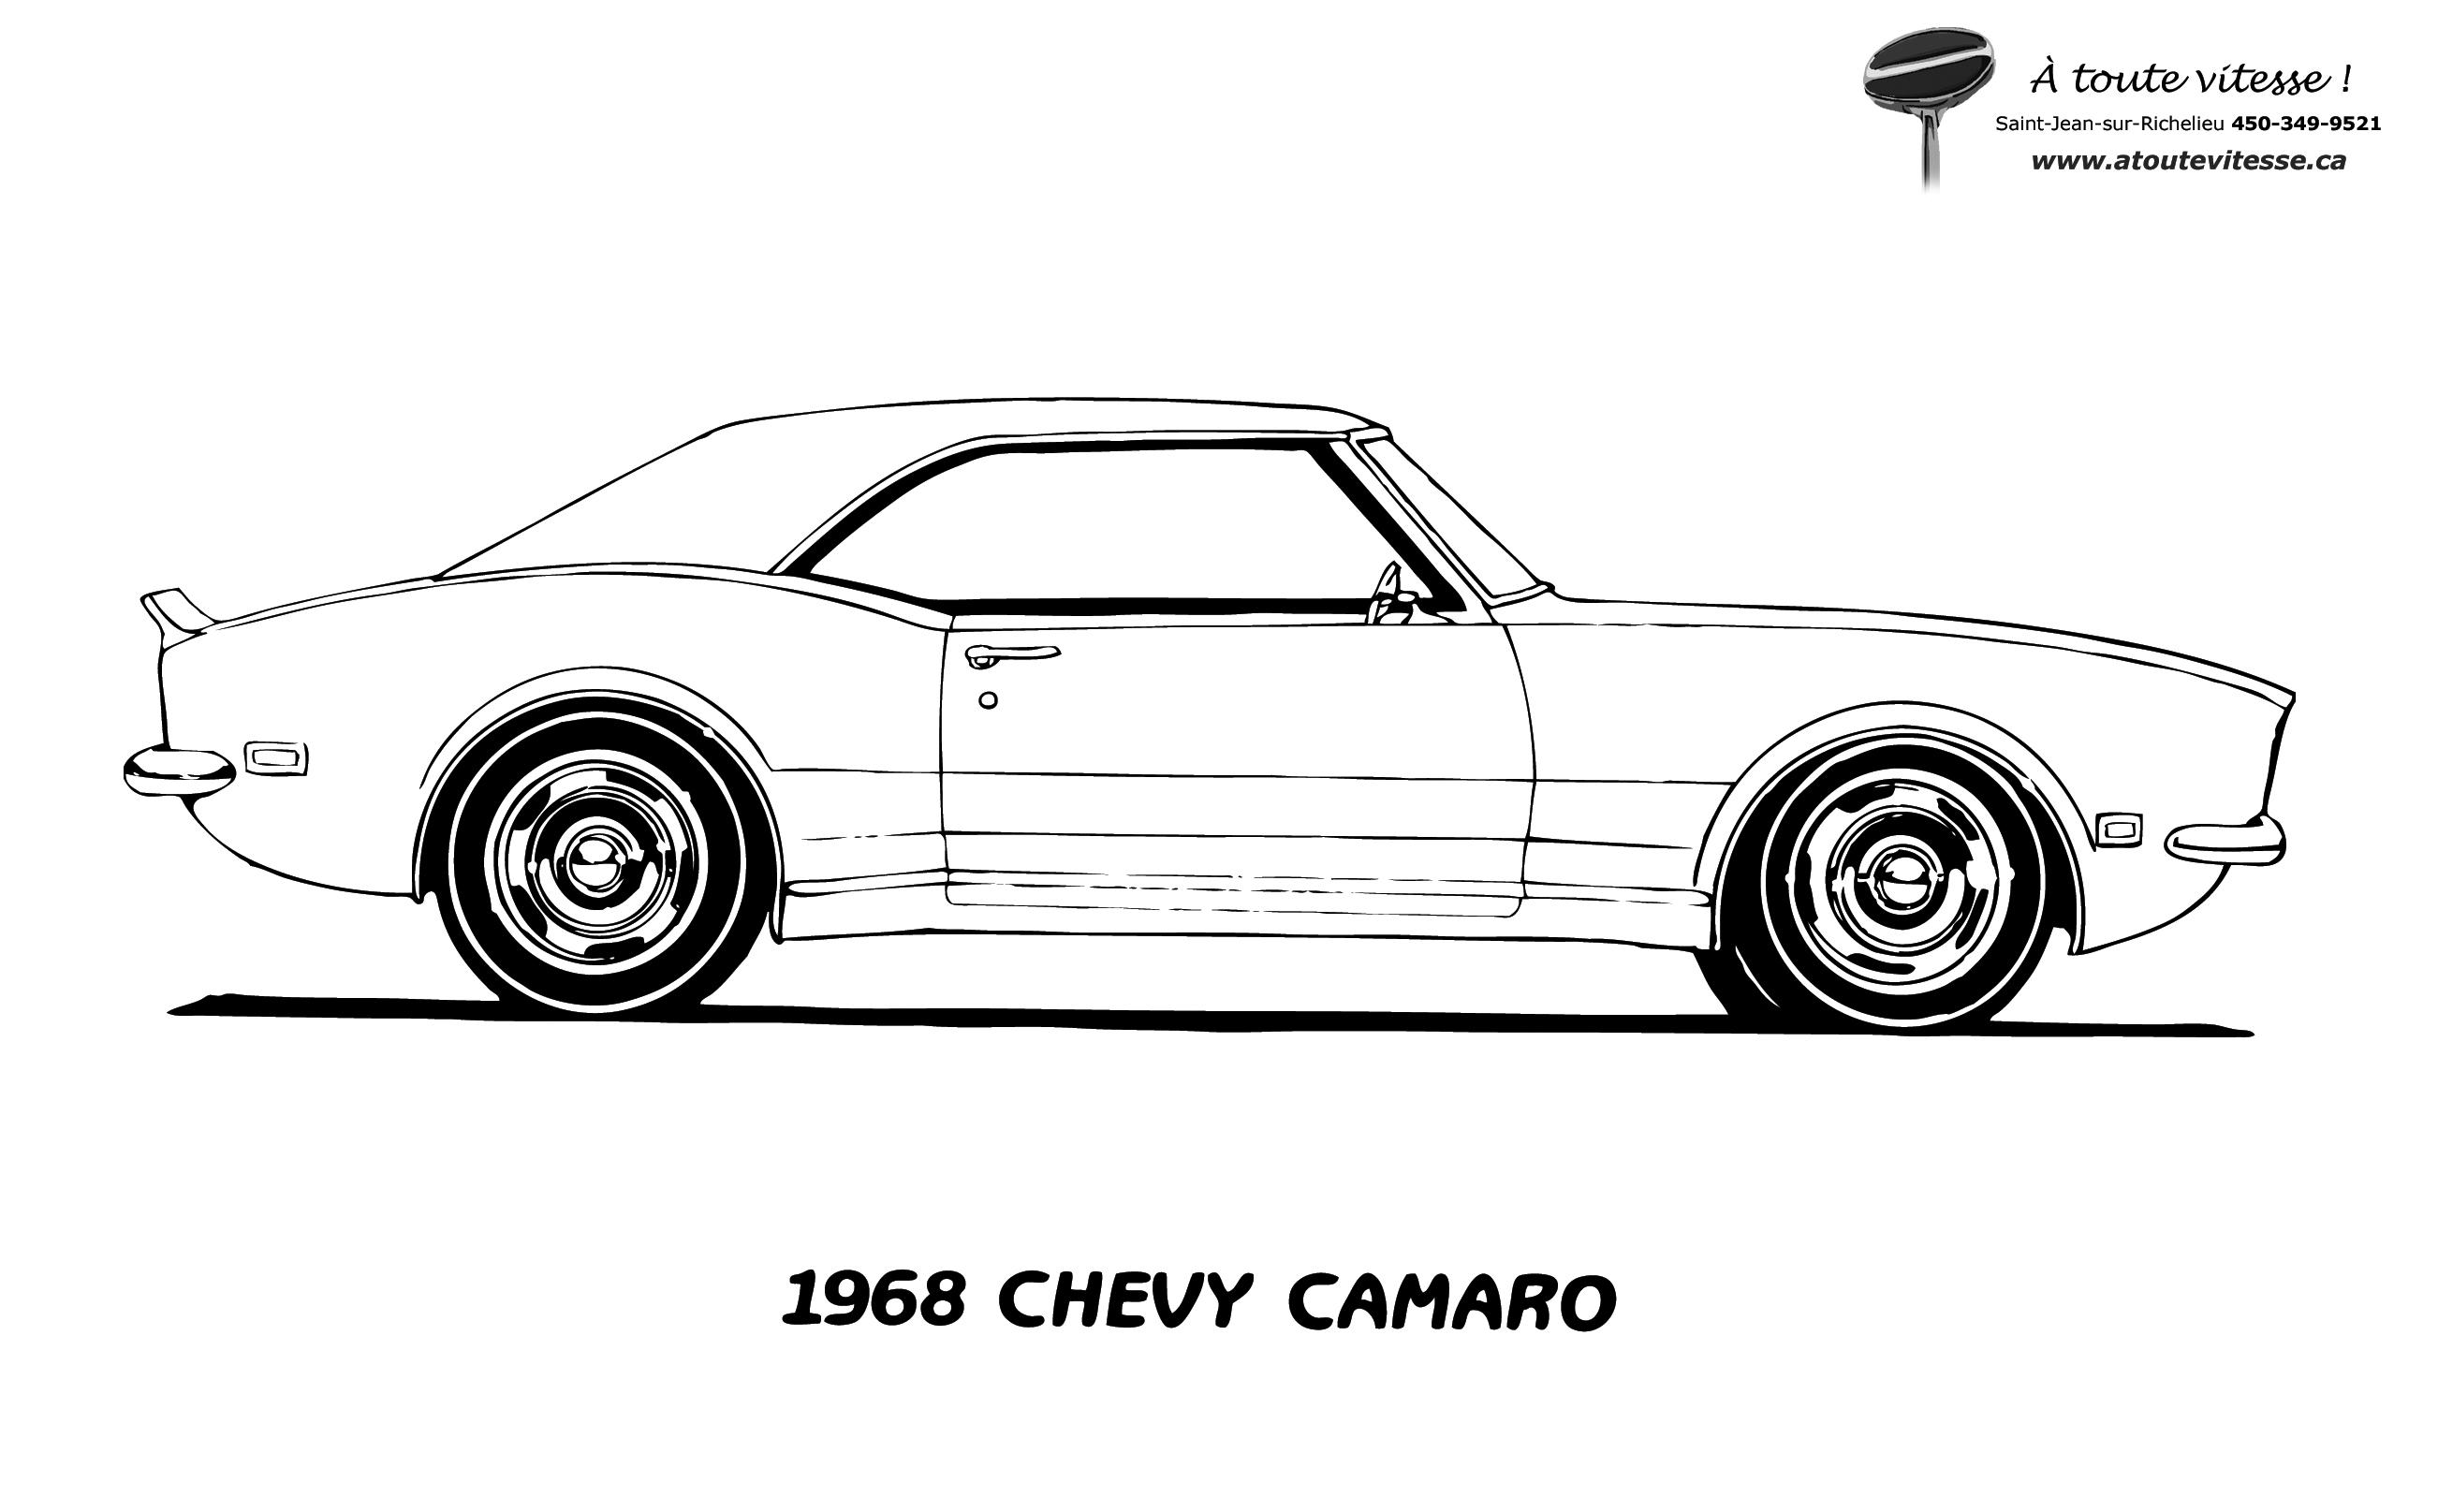 Birth Of An Icon The History Of The Chevy Bowtie 114477 also Porsche Carrera Gt in addition Coloring Cars in addition Porsche 911 gt3 cup 996 additionally Ausmalbilder Lamborghini Ausdrucken 1. on porsche gt3